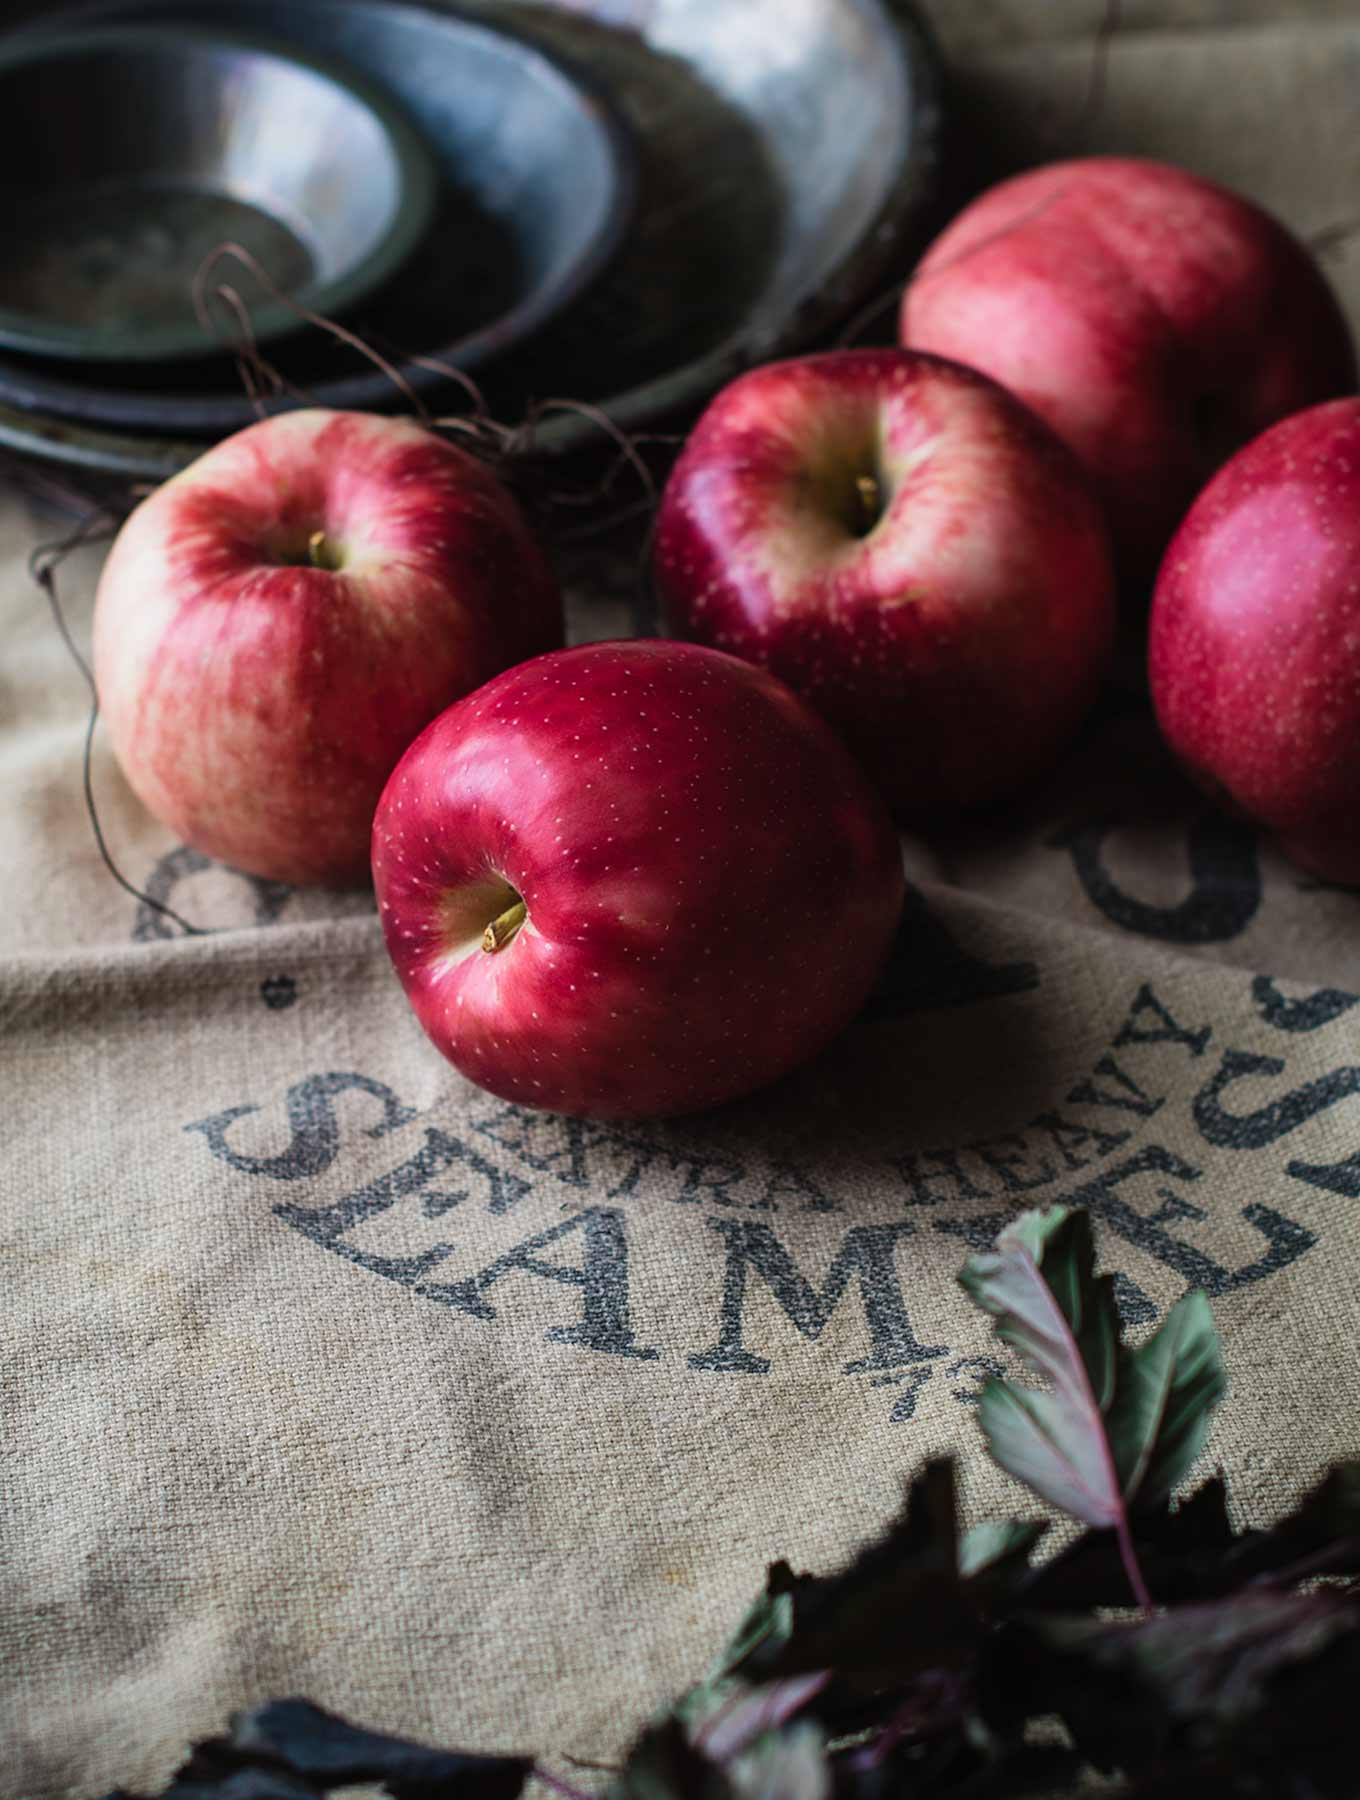 Apples on a burlap sack